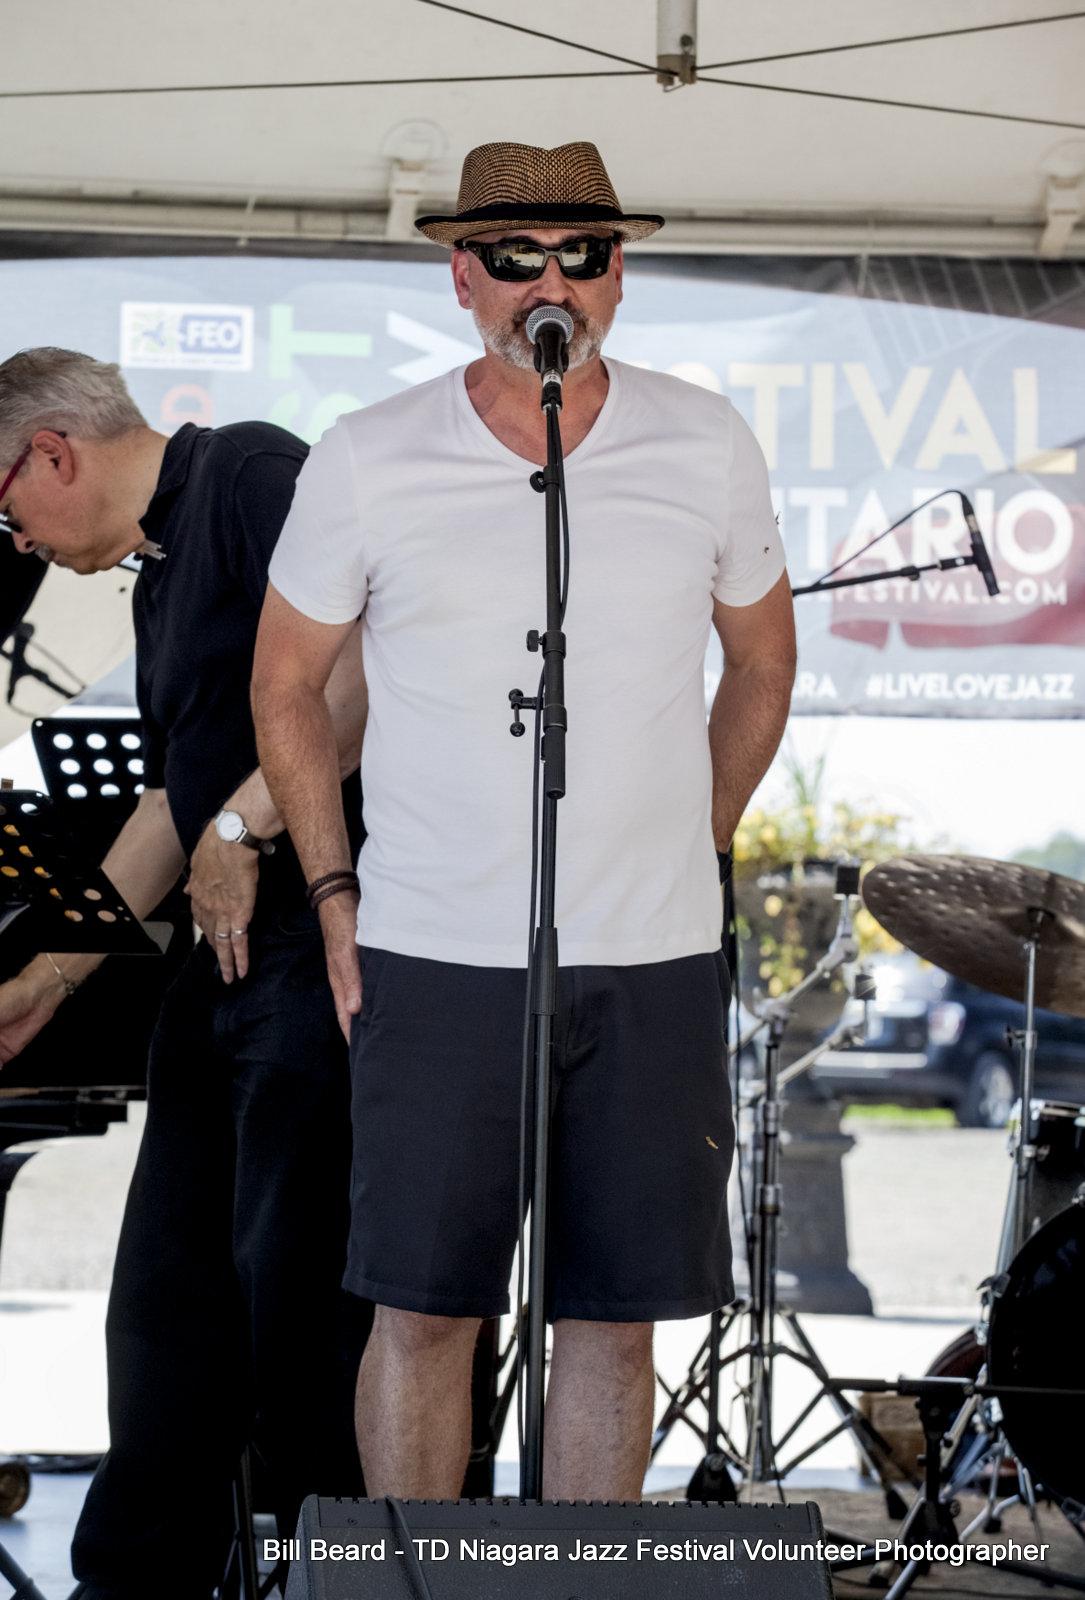 Jazz.FM 91.1 Emcee Walter Venafro at JAZZ on the RISE - Canada 150 Celebration - Megalomaniac Winery - Sunday, July 30th, 2017. Photo: Bill Beard